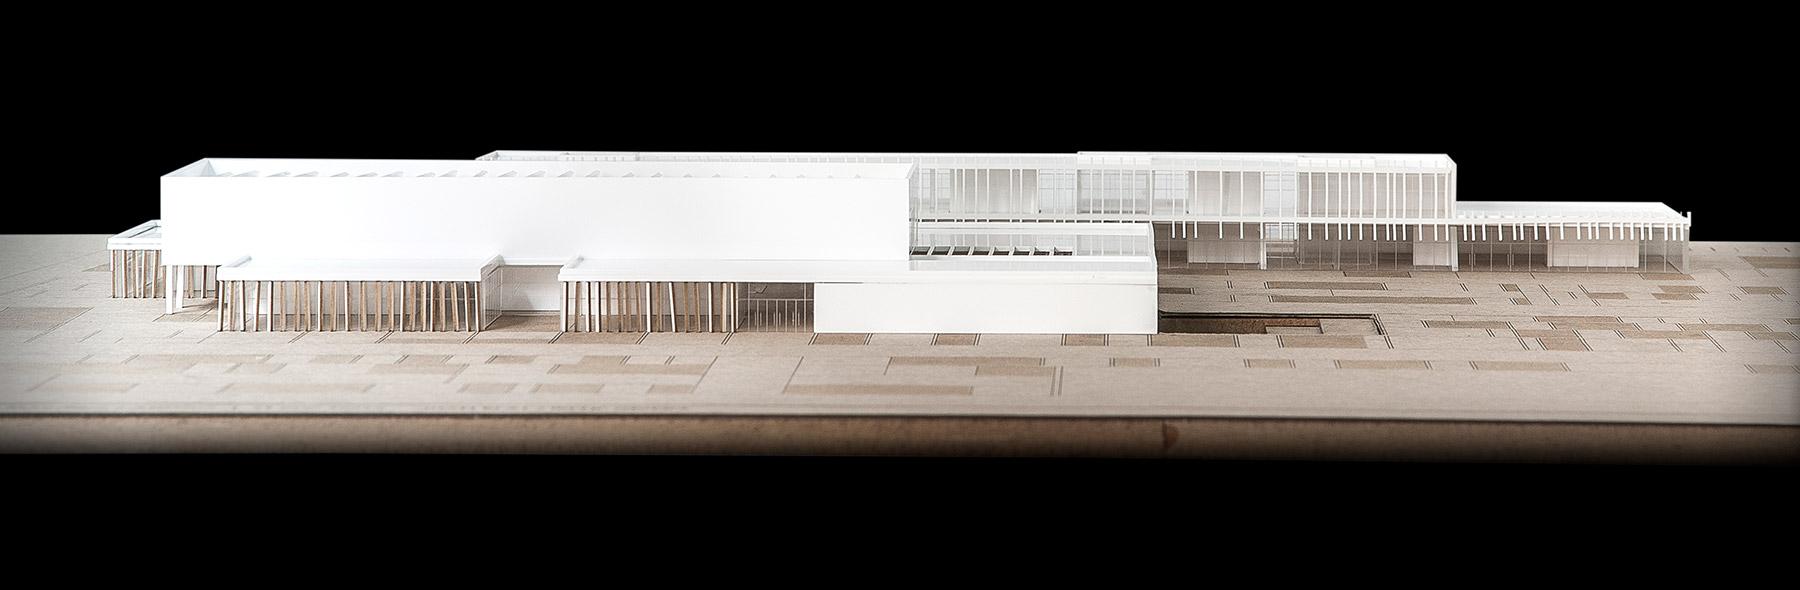 maqueta-arquitectura-architecture model-pfc-etsav-upv-Universidad-Popular-Valencia (3)